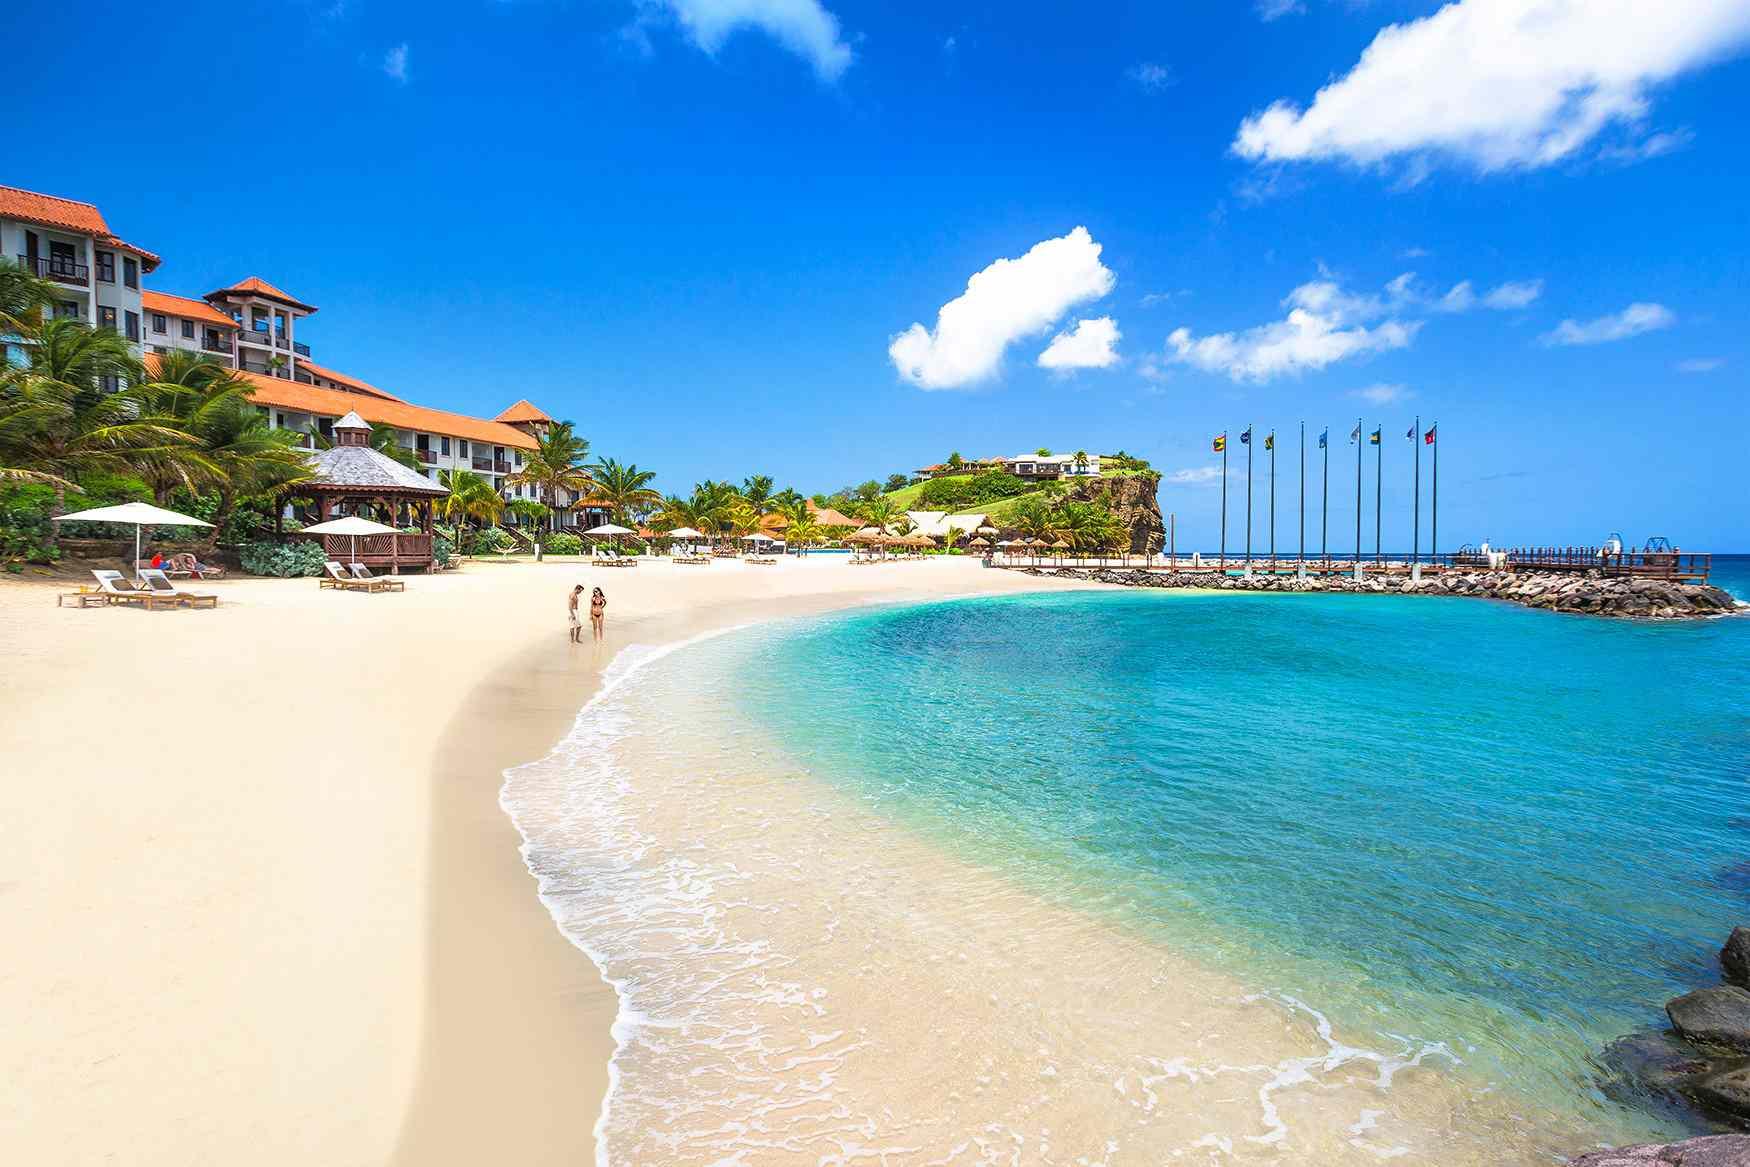 Sandals Grenada – St. George's, Grenada